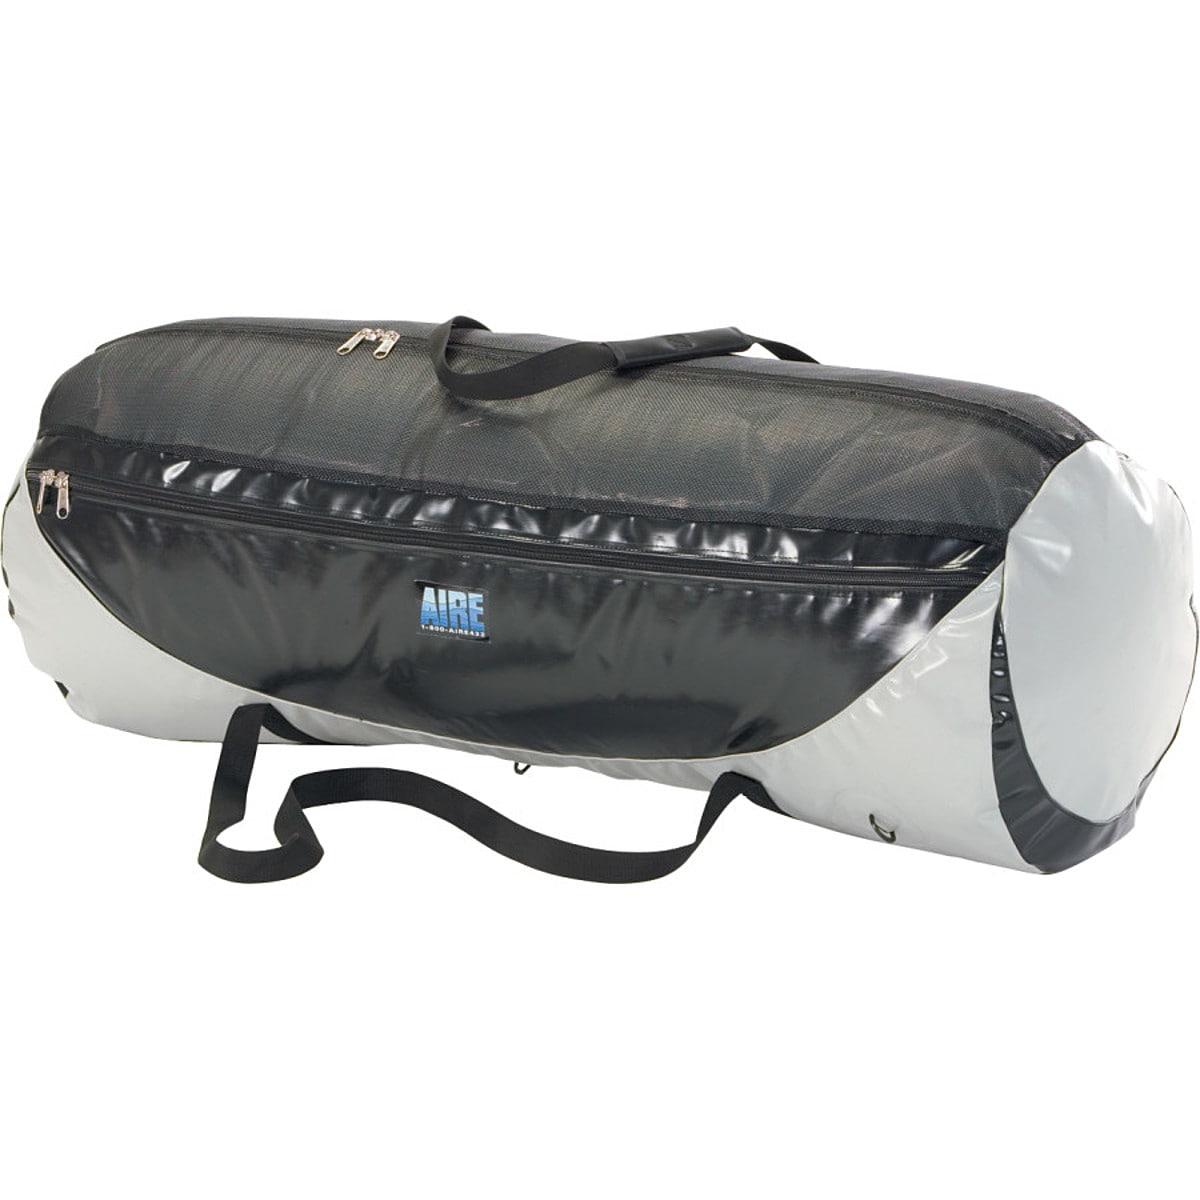 Aire Kayak Bag